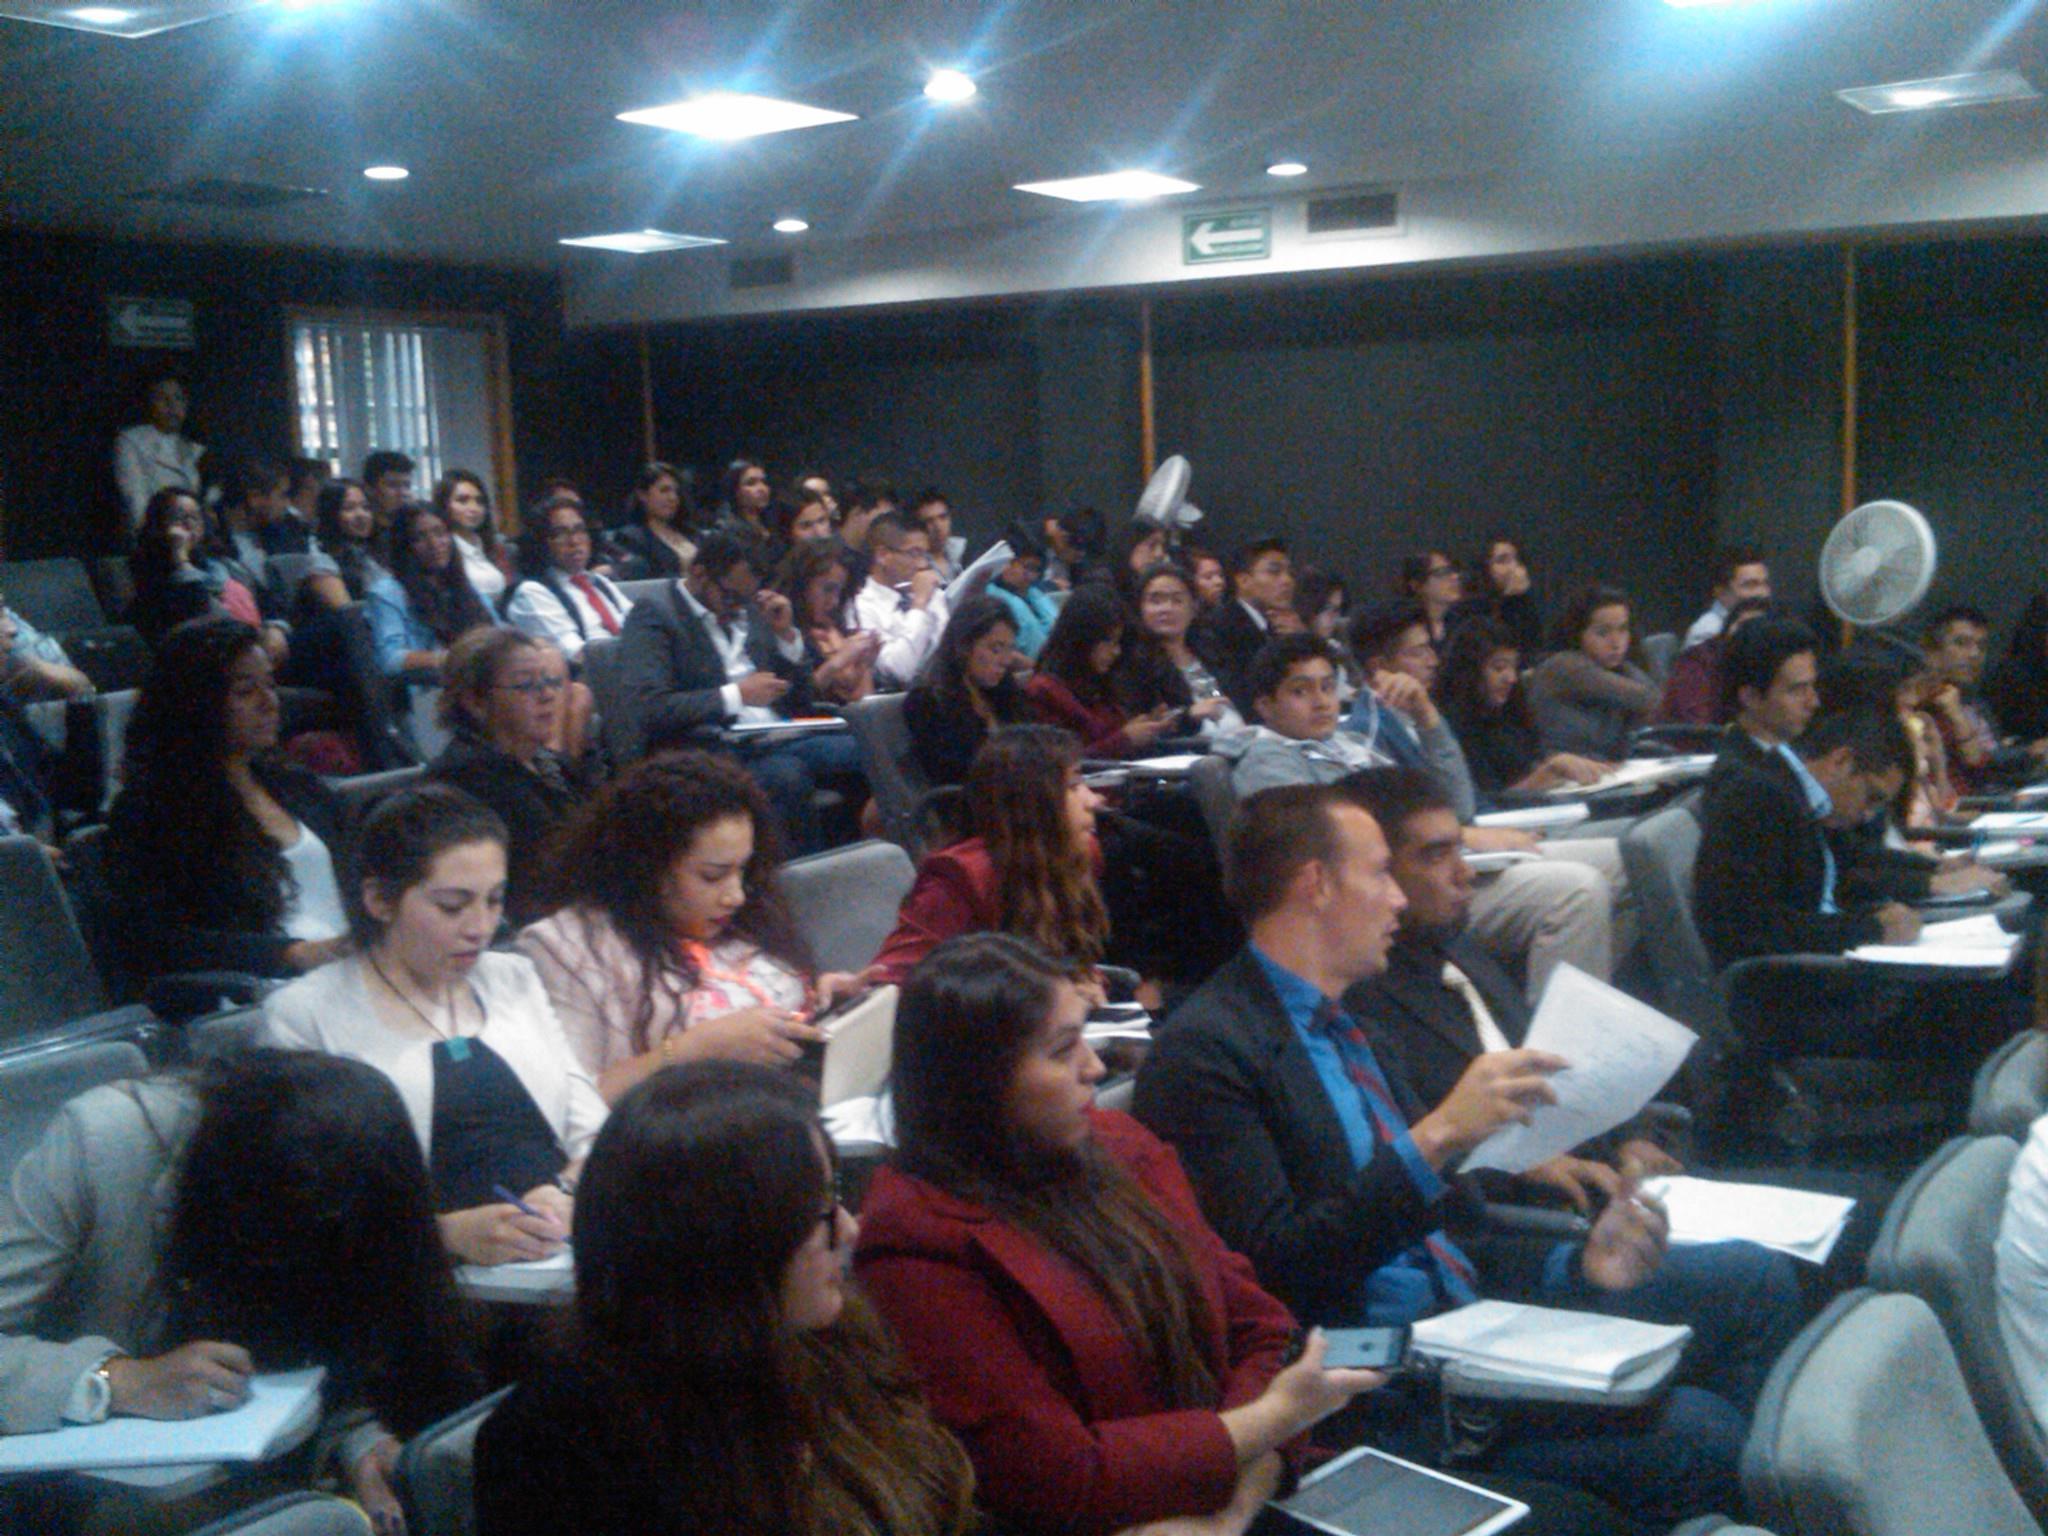 1er_foro_intercultural_de_paz,_Universidad_del_Valle_de_México_3